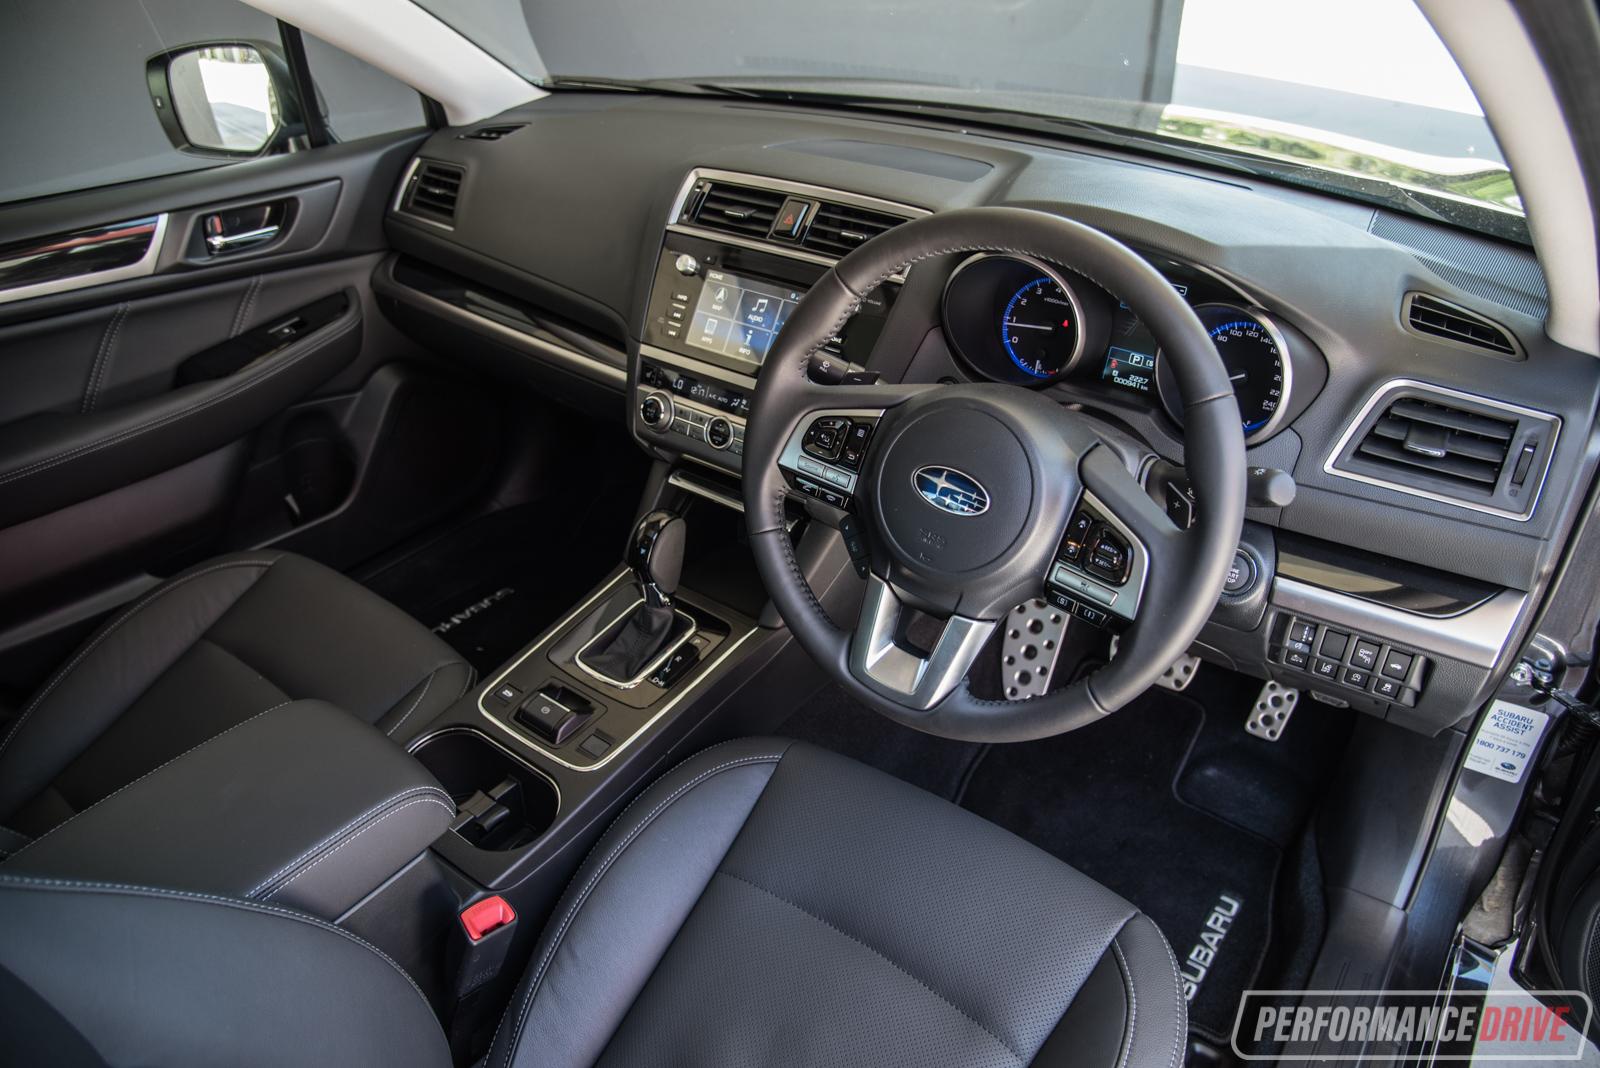 2017 Subaru Liberty 2 5i Premium Review Video